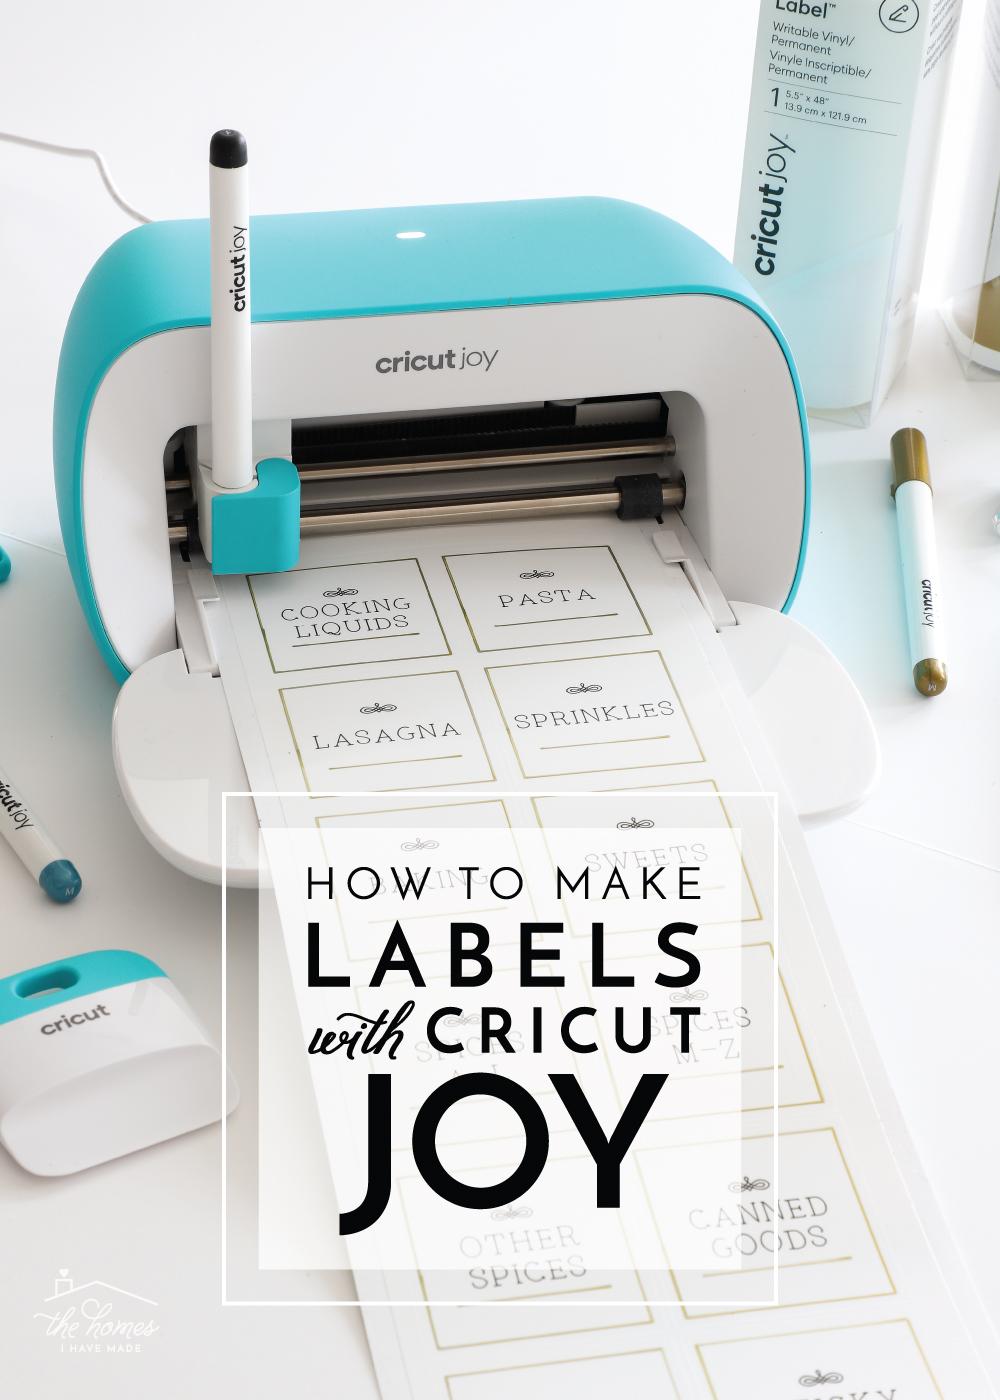 How To Make Labels With Cricut Joy The Homes I Have Made In 2020 How To Make Labels Cricut Tutorials Diy Cricut